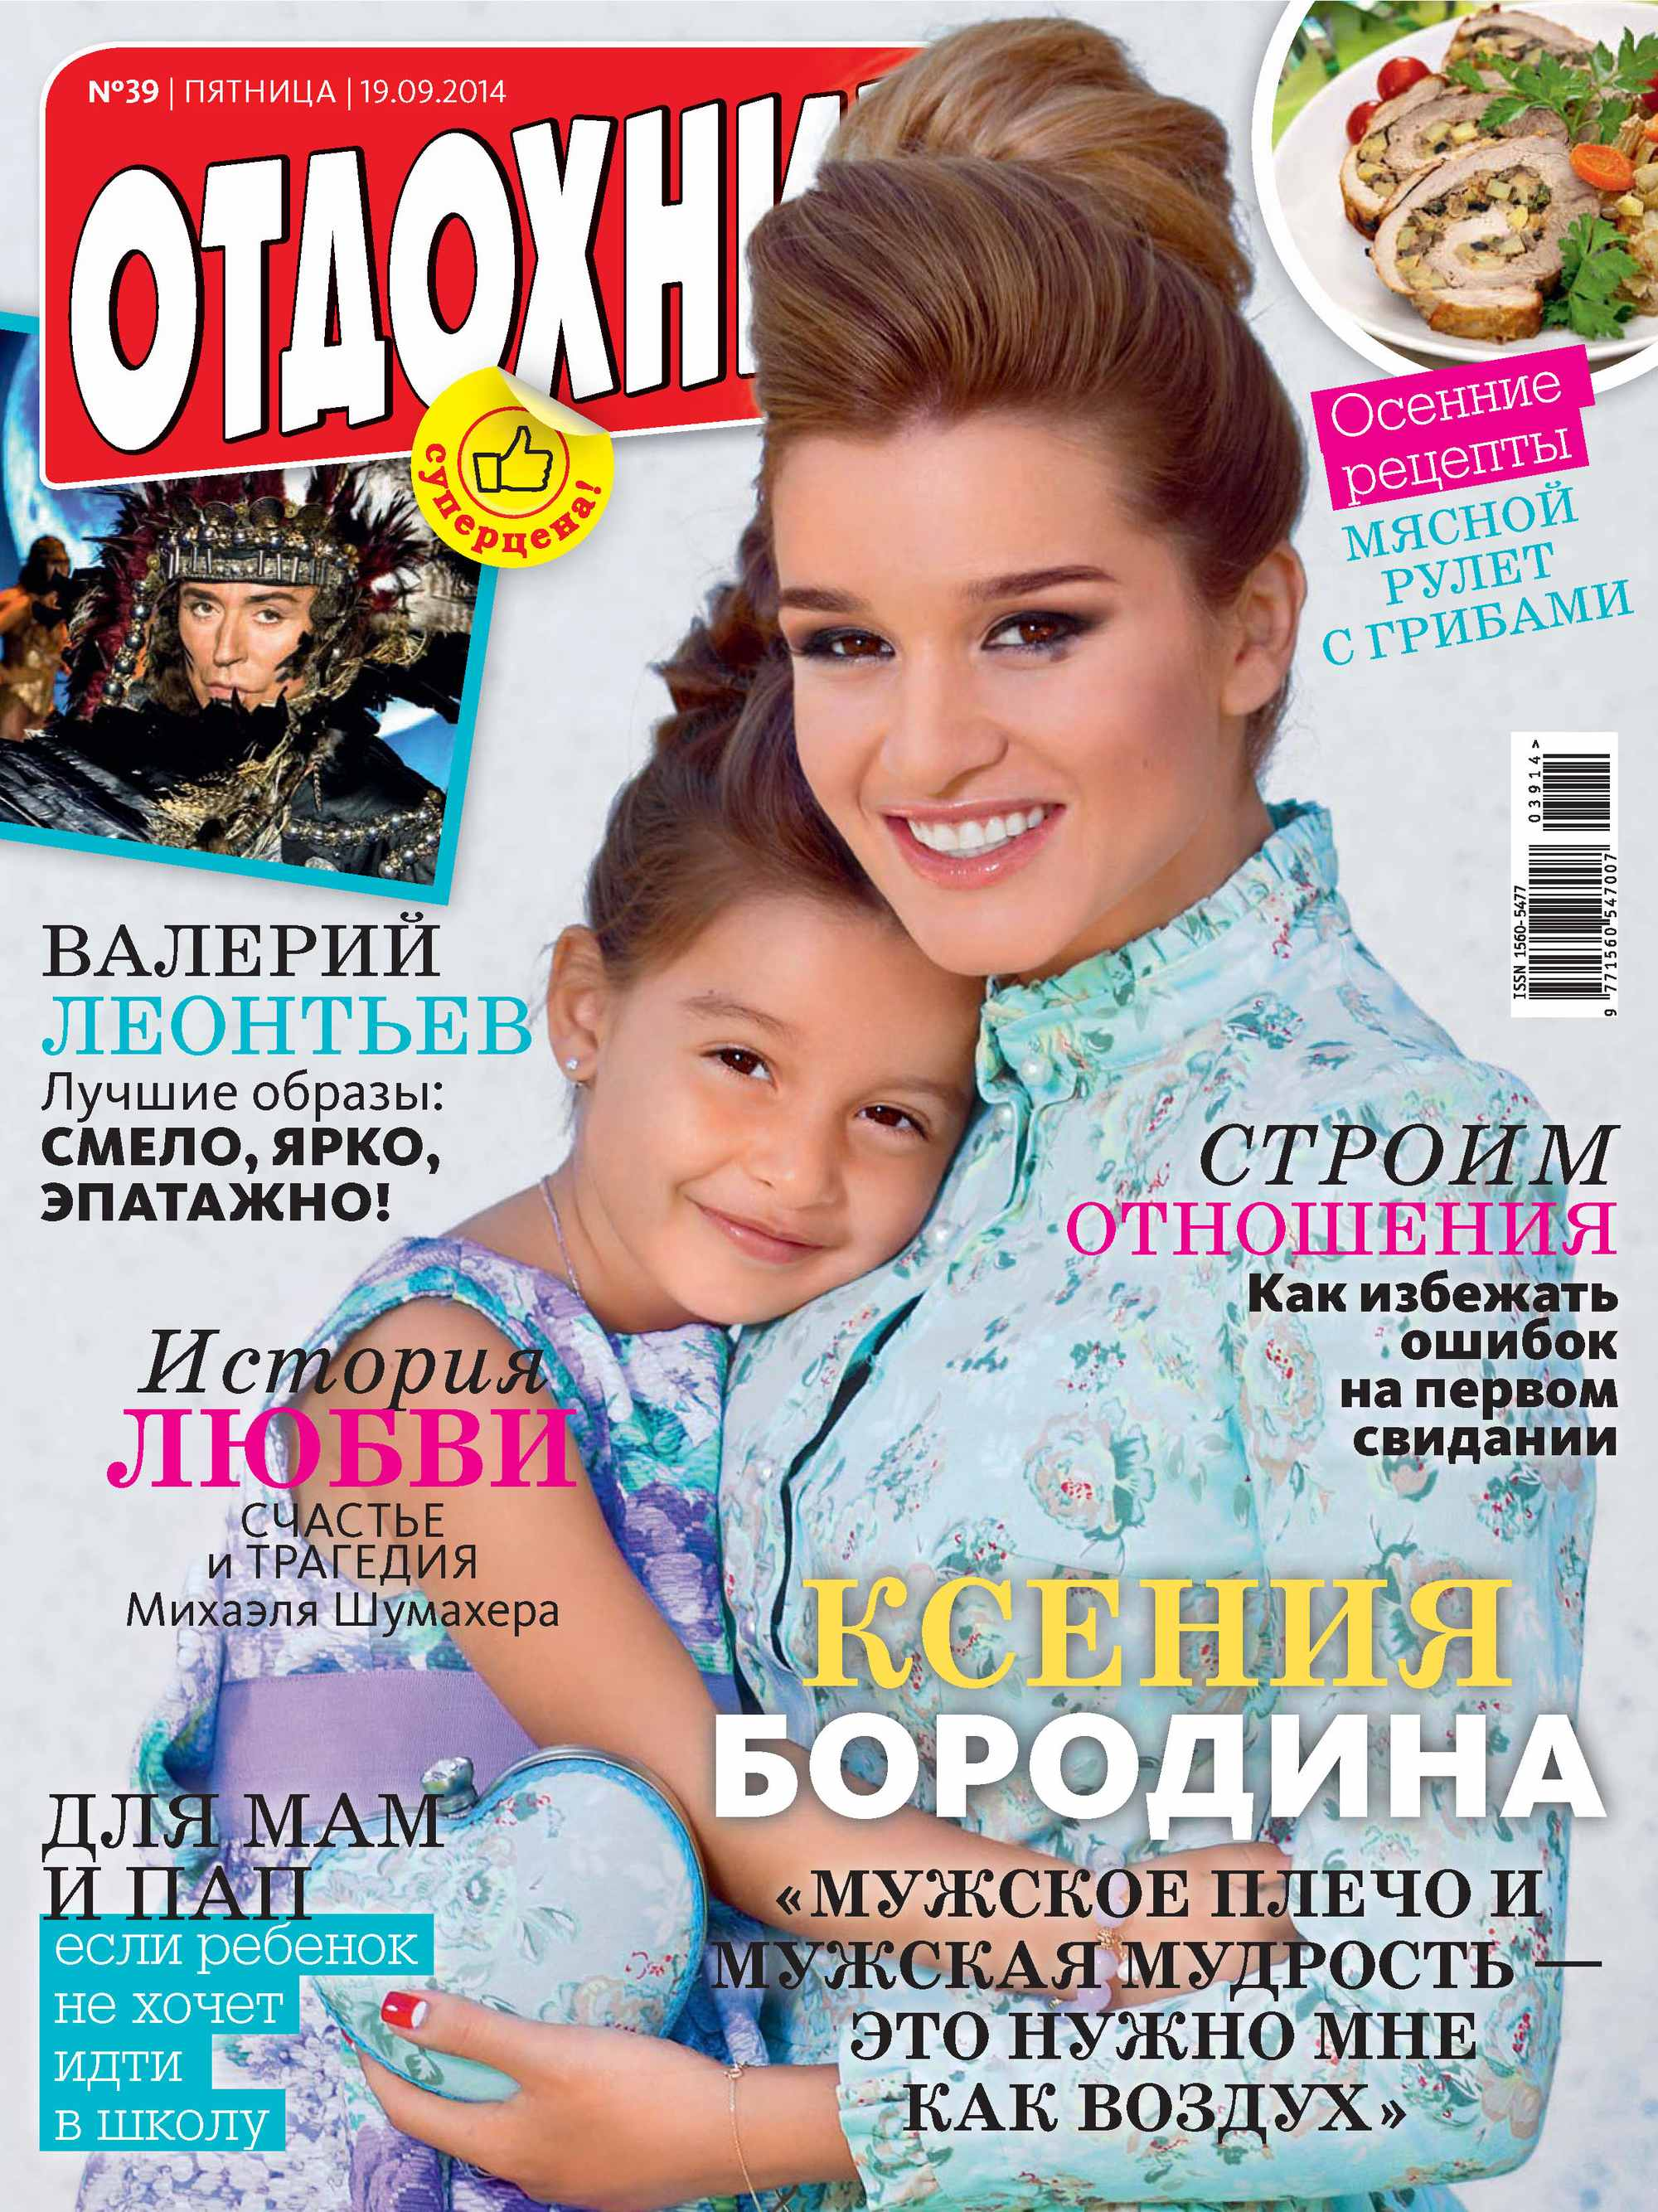 ИД «Бурда» Журнал «Отдохни!» №39/2014 цена